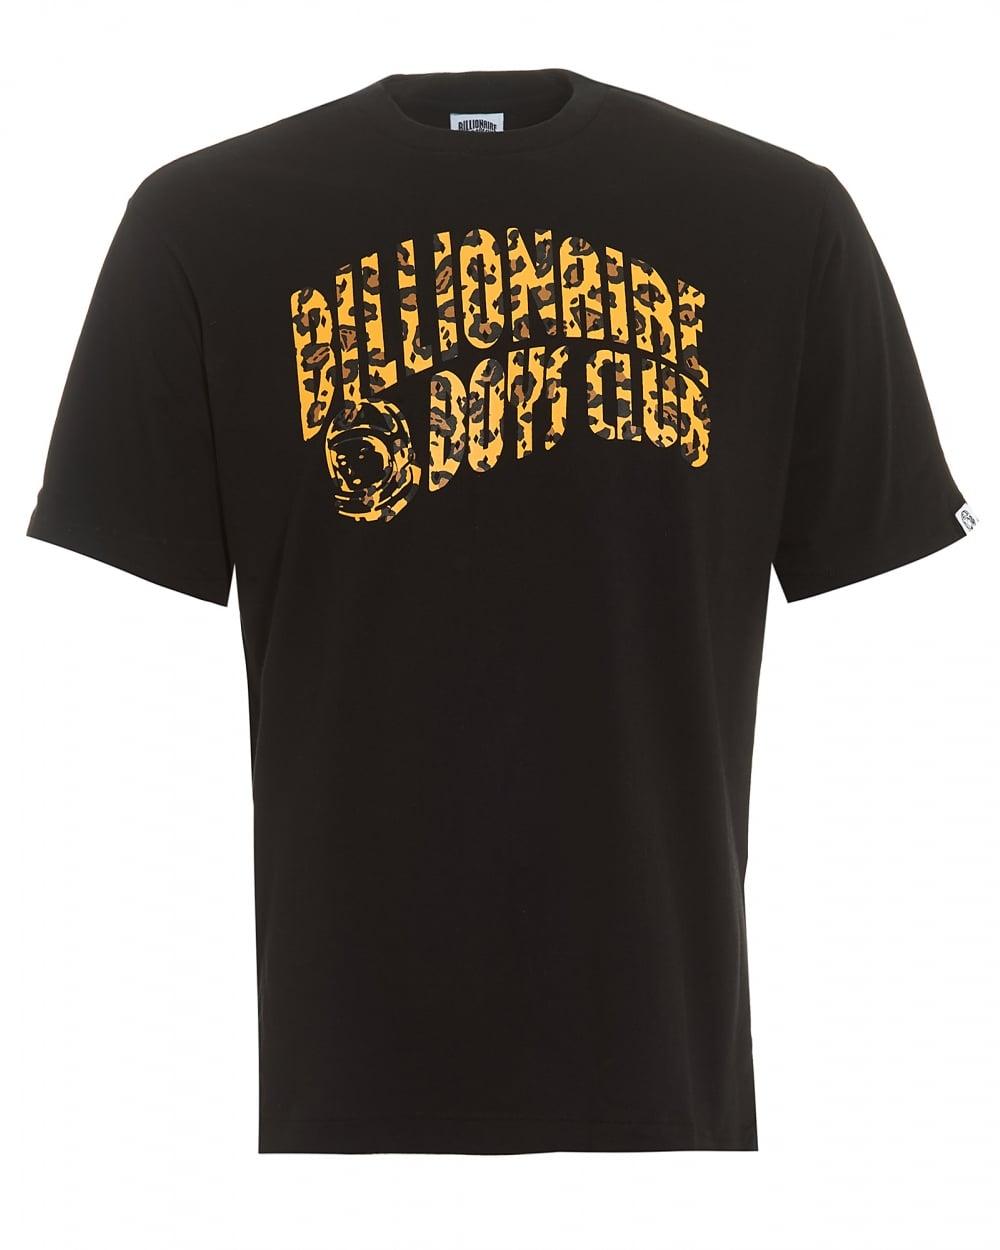 Mens Leopard Arch Logo T Shirt Graphic Black Tee